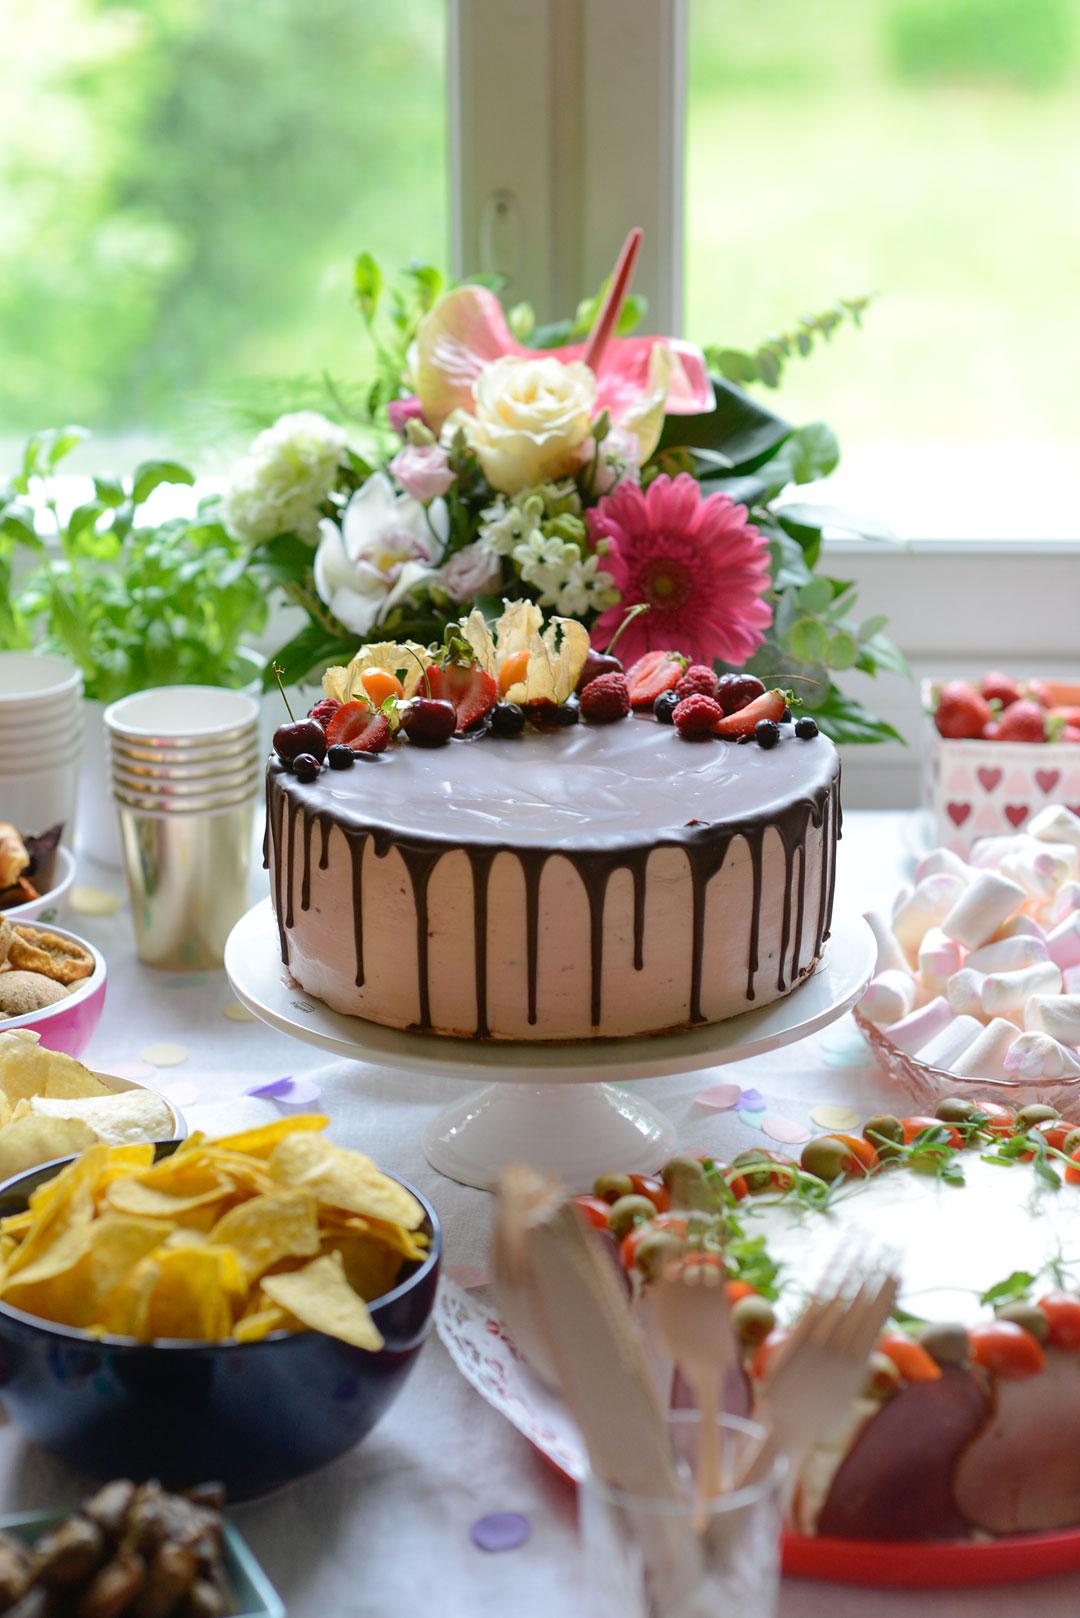 The most gorgeous vegan and gluten-free cake by Kahvila Tuokio